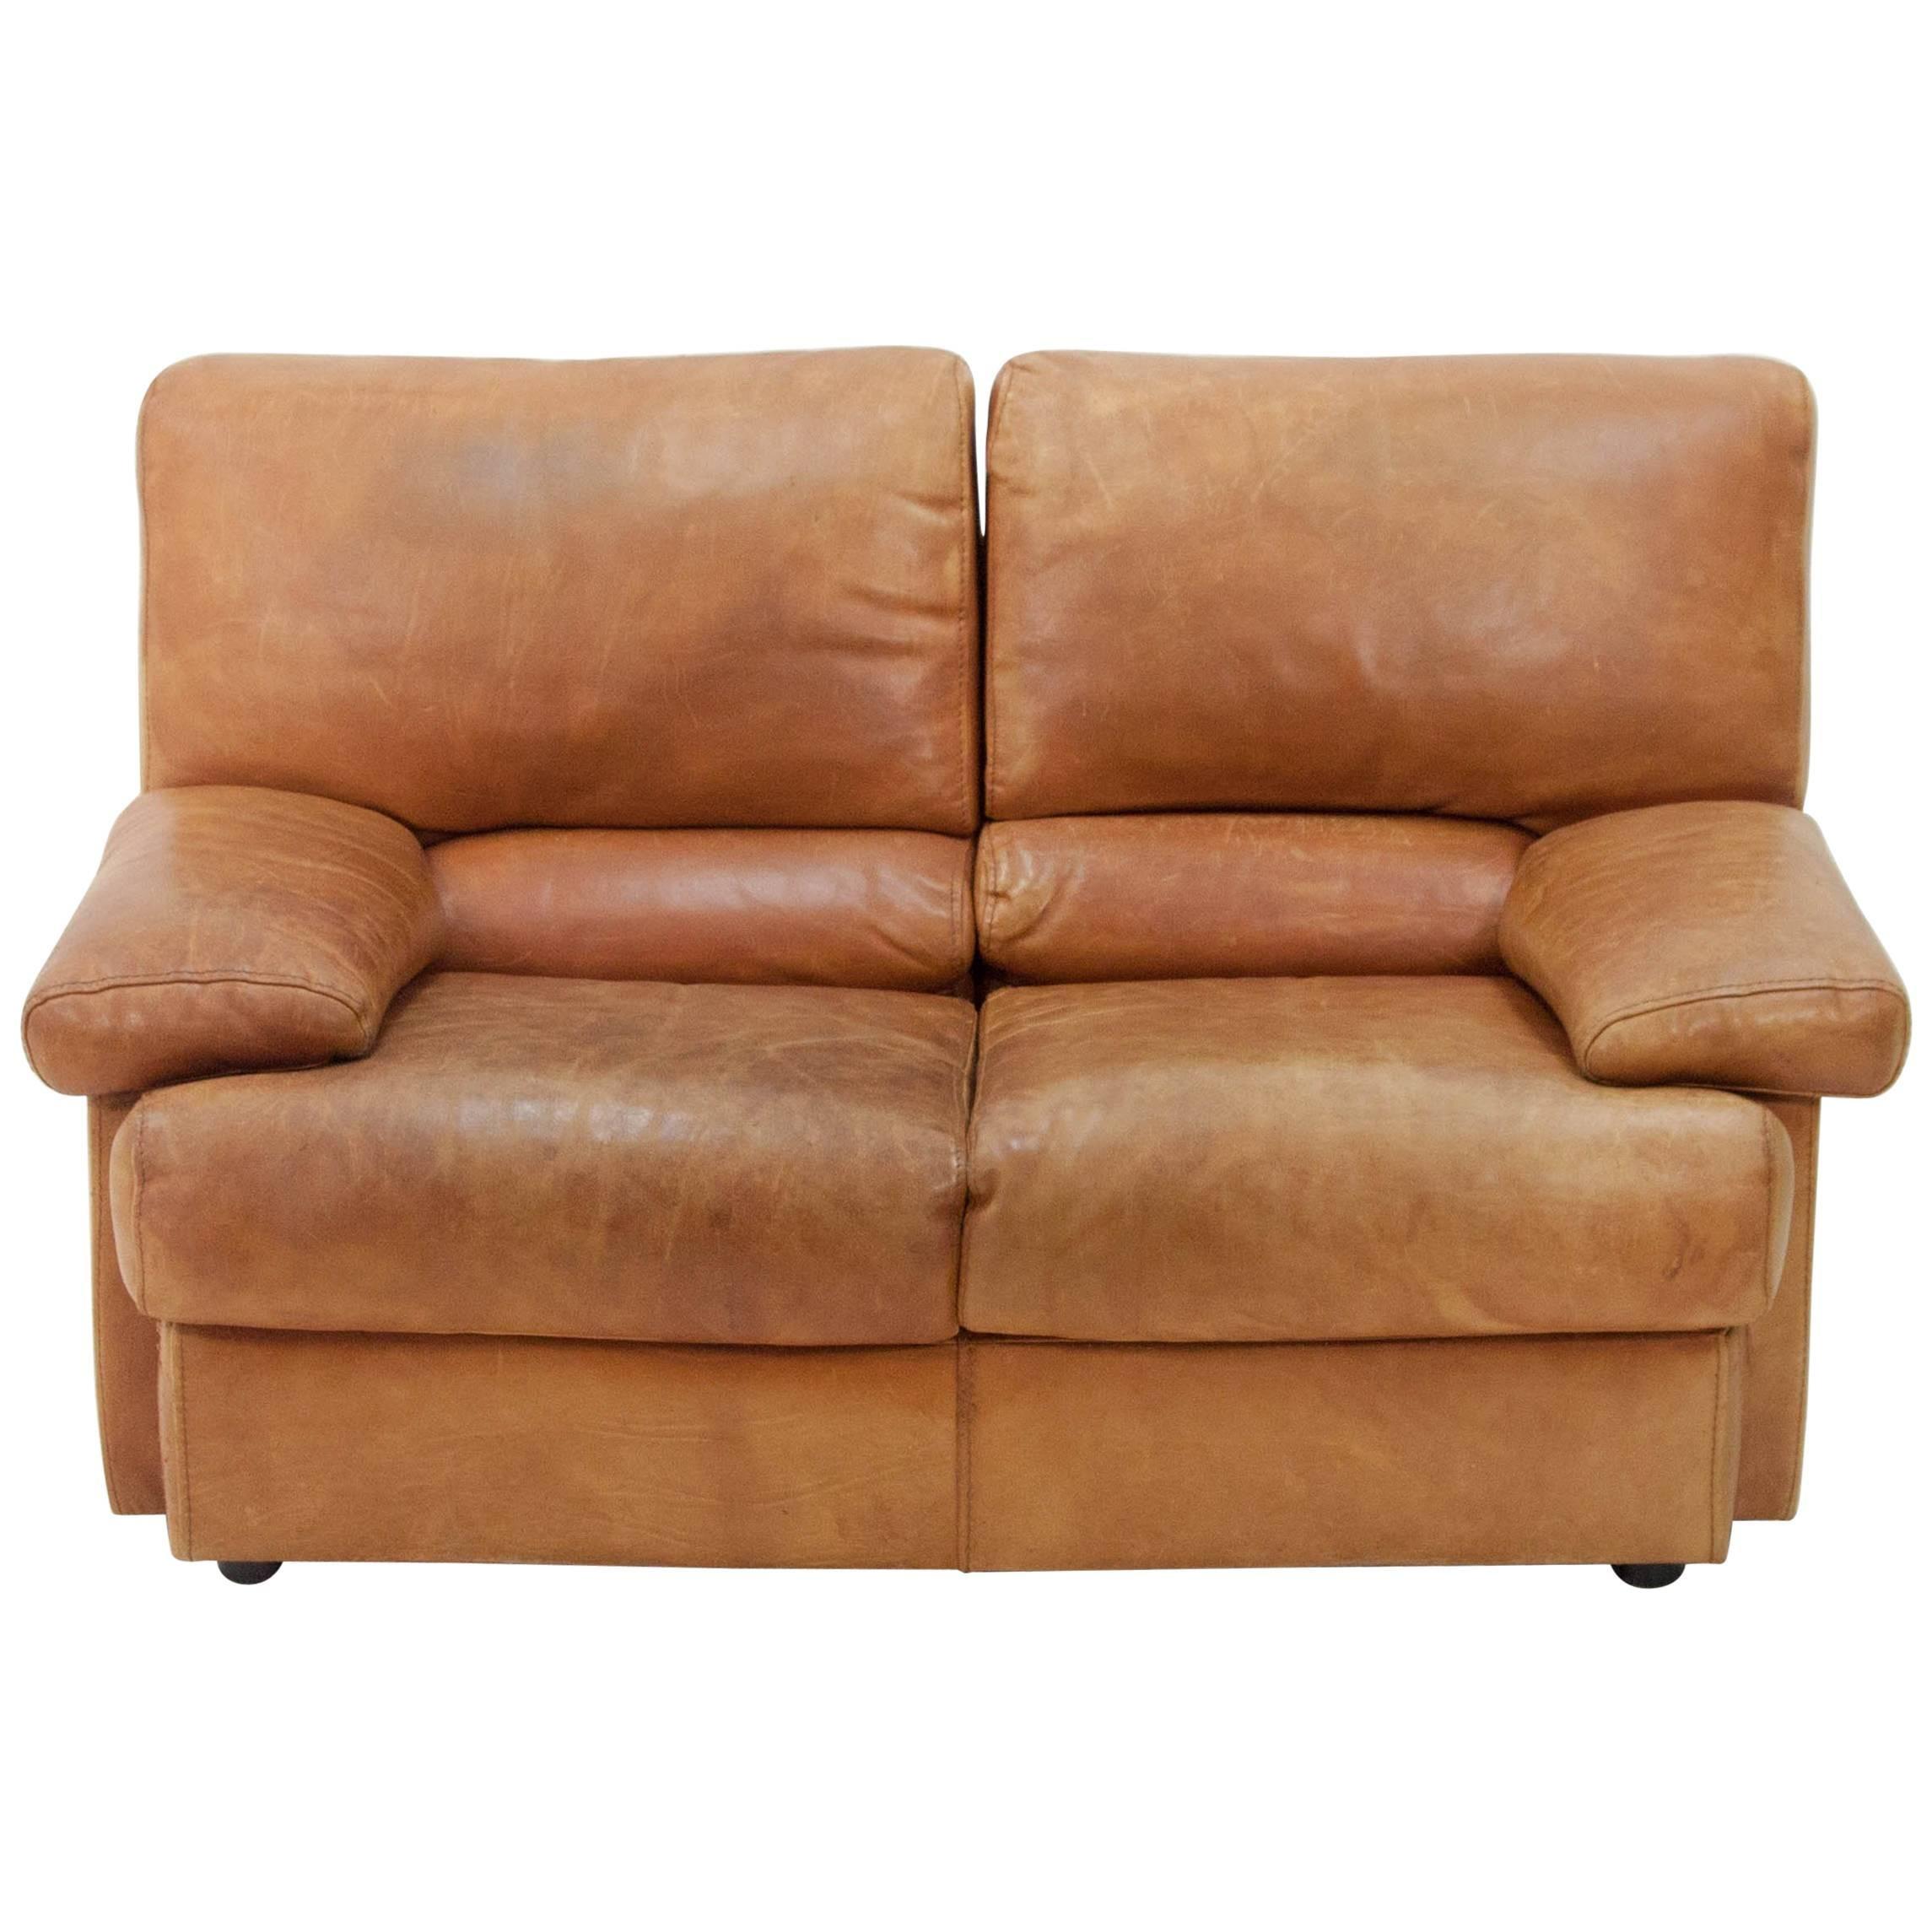 Bon Cierre Imbottiti Butterscotch Leather Sofa For Sale